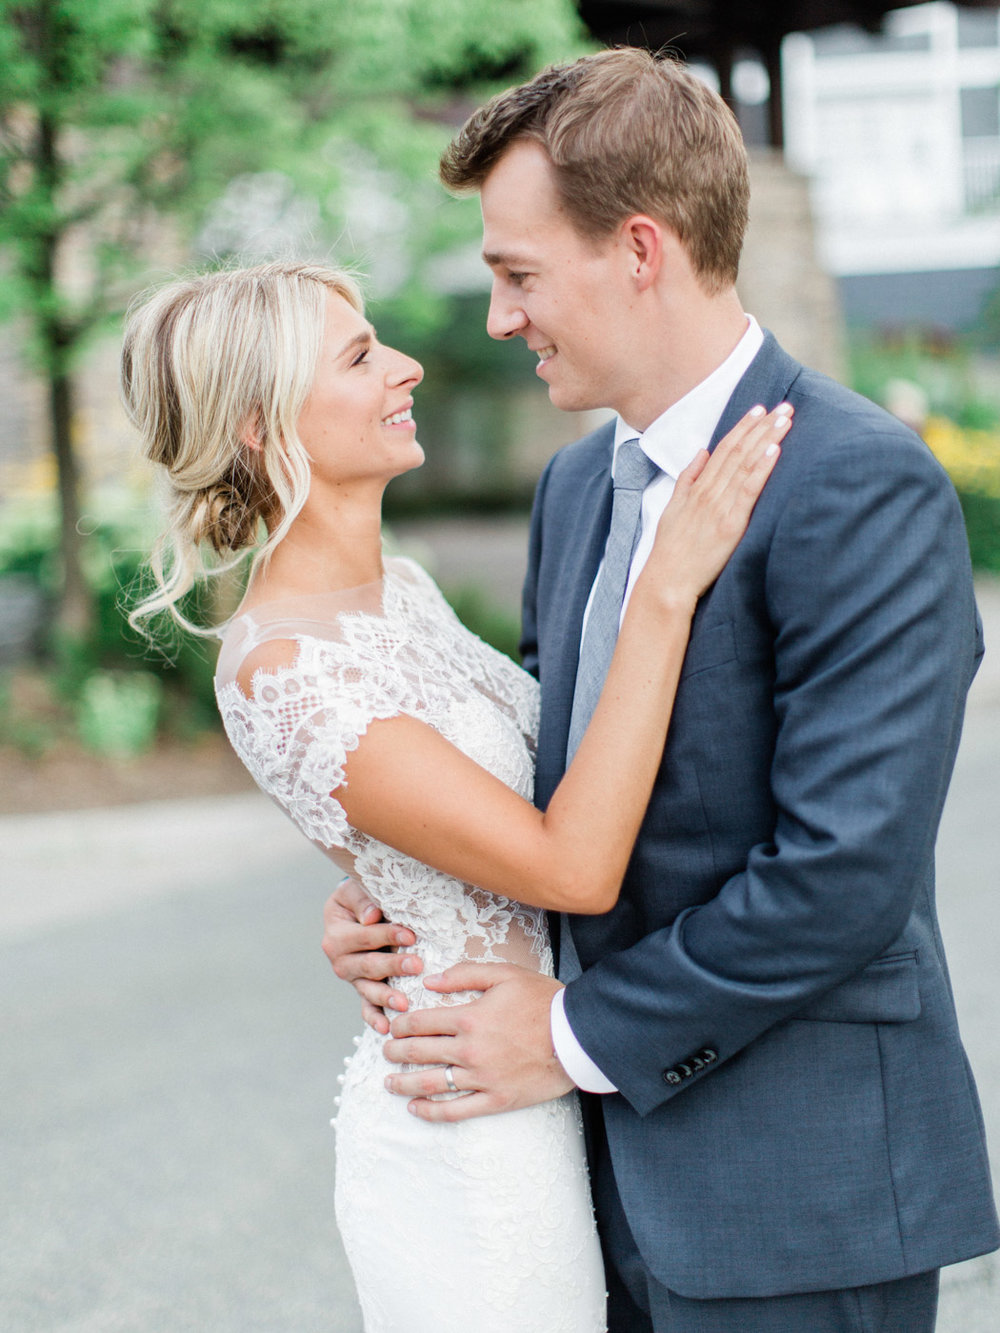 Toronto-Muskoka-wedding-photographer-summery-fun-documentary-the-marriott-rosseau105.jpg